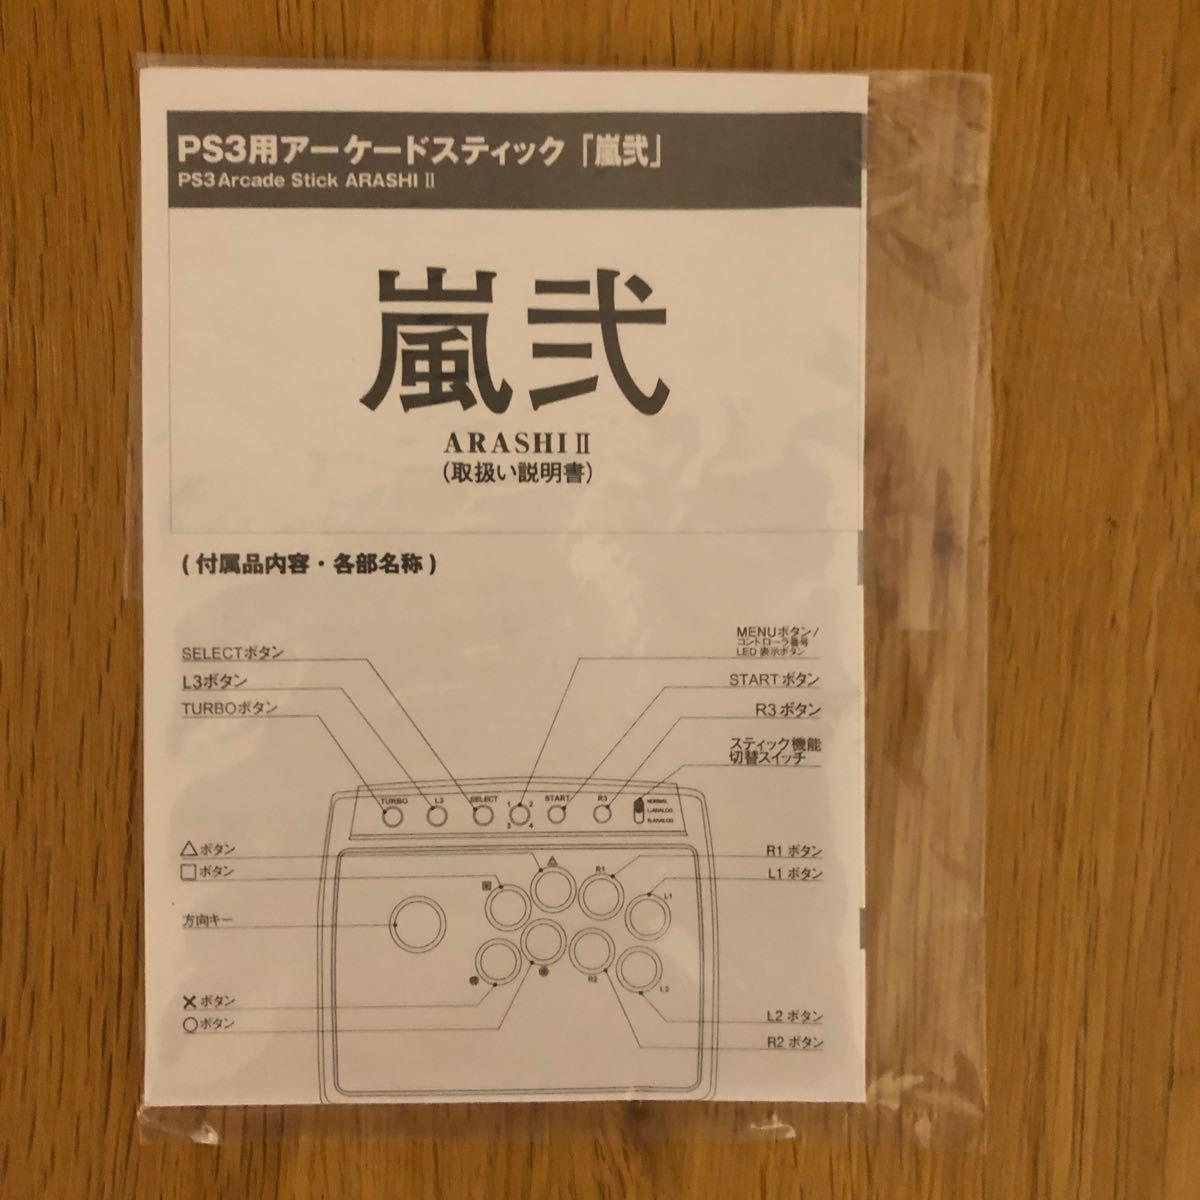 PS3 プレイステーション3 アーケードスティック 嵐 (ARASHI)